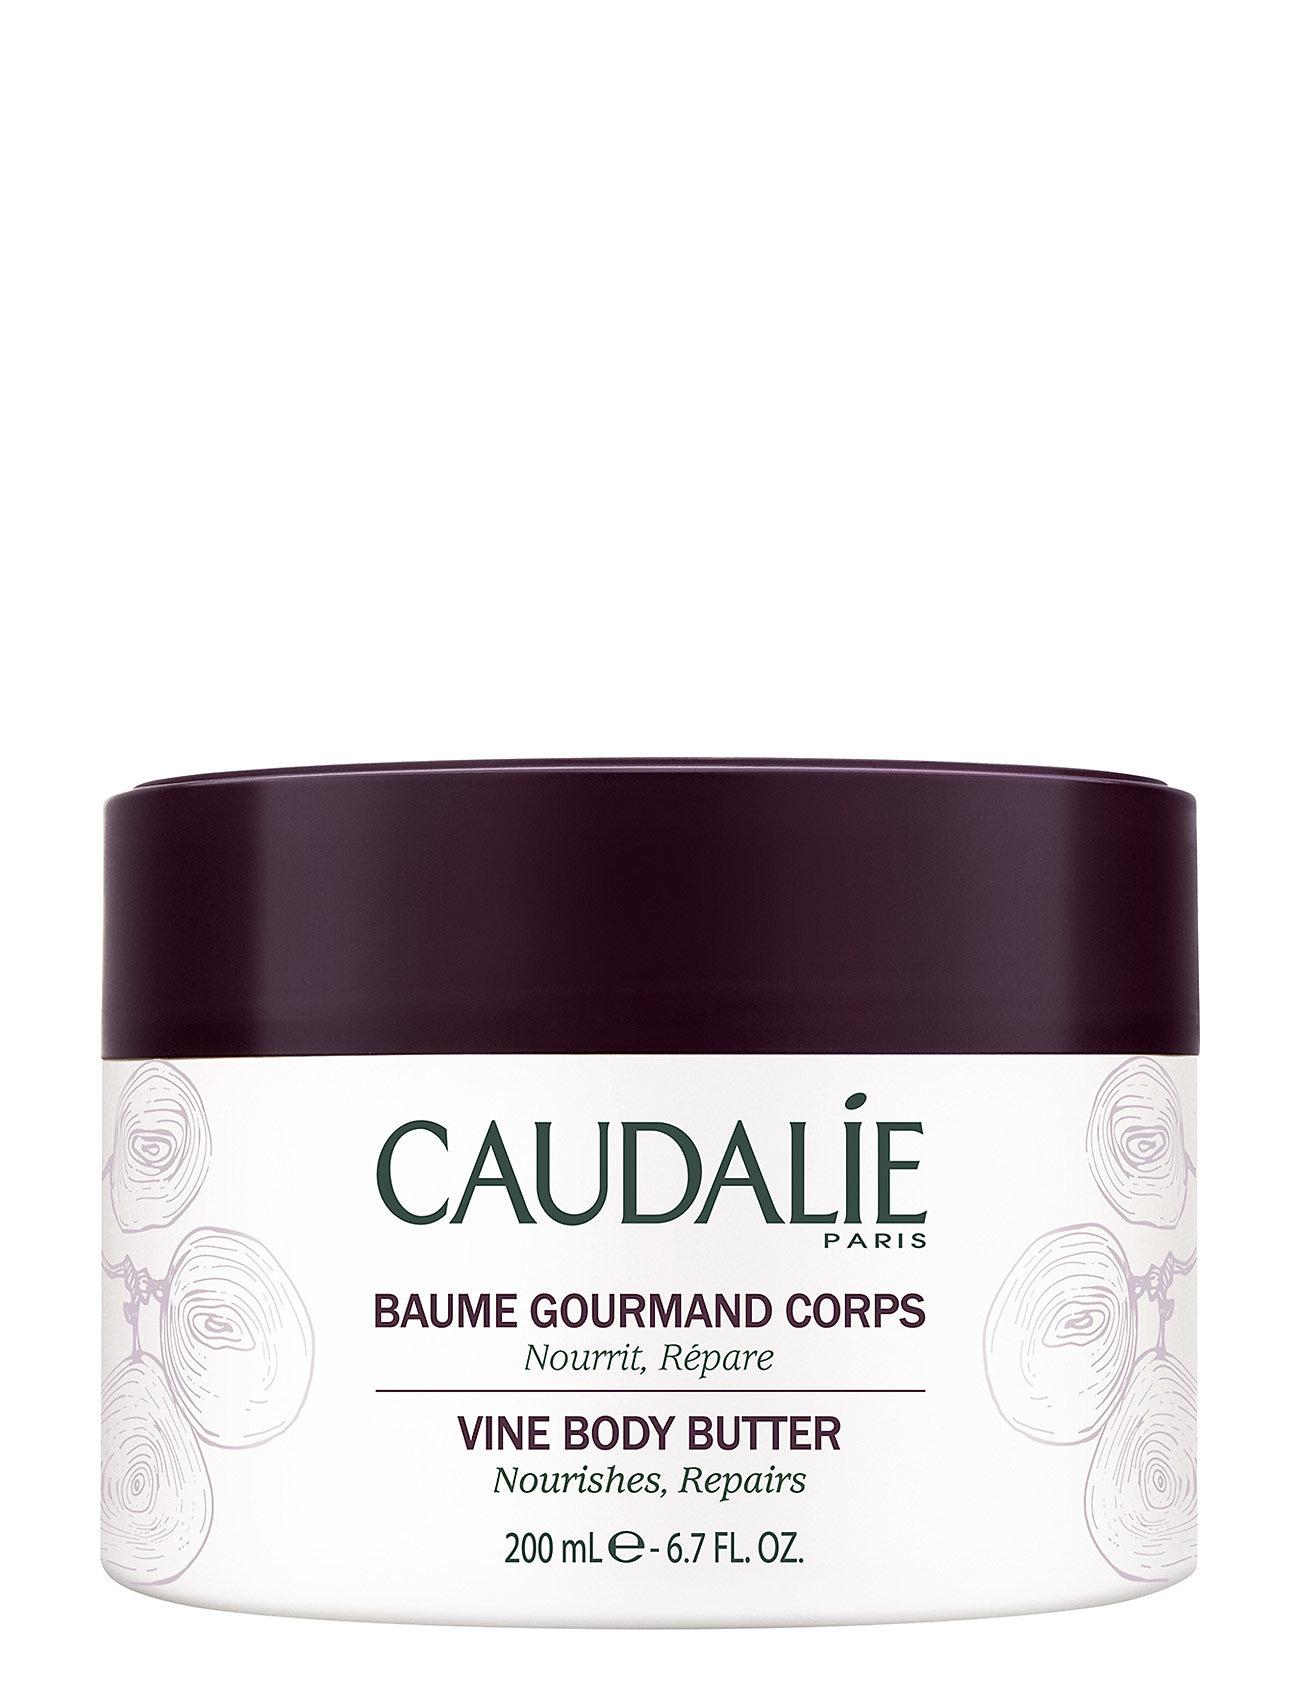 CAUDALIE Vine Body Butter - NO COLOR